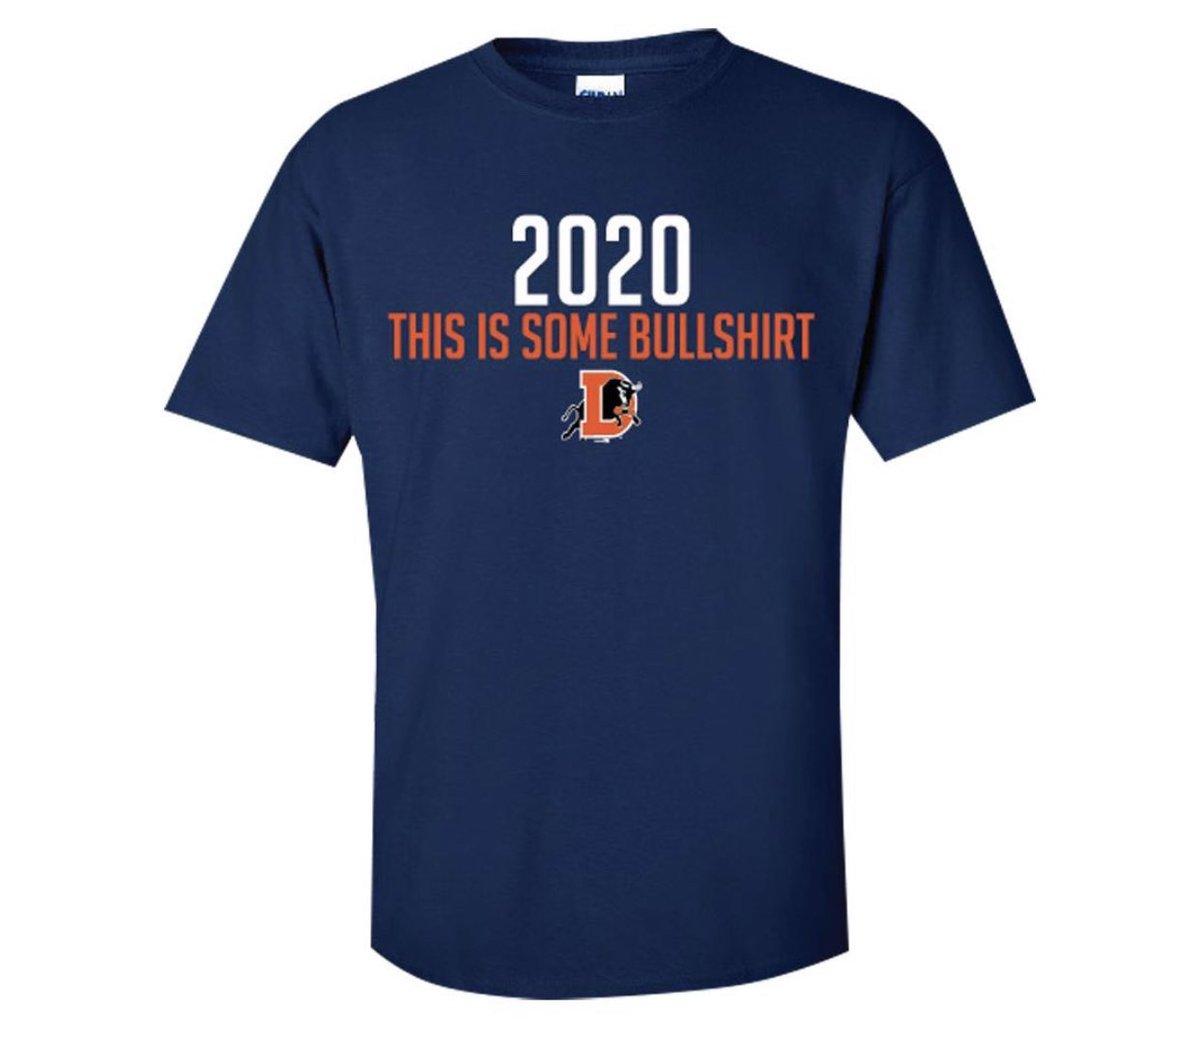 2020 but make it fashion